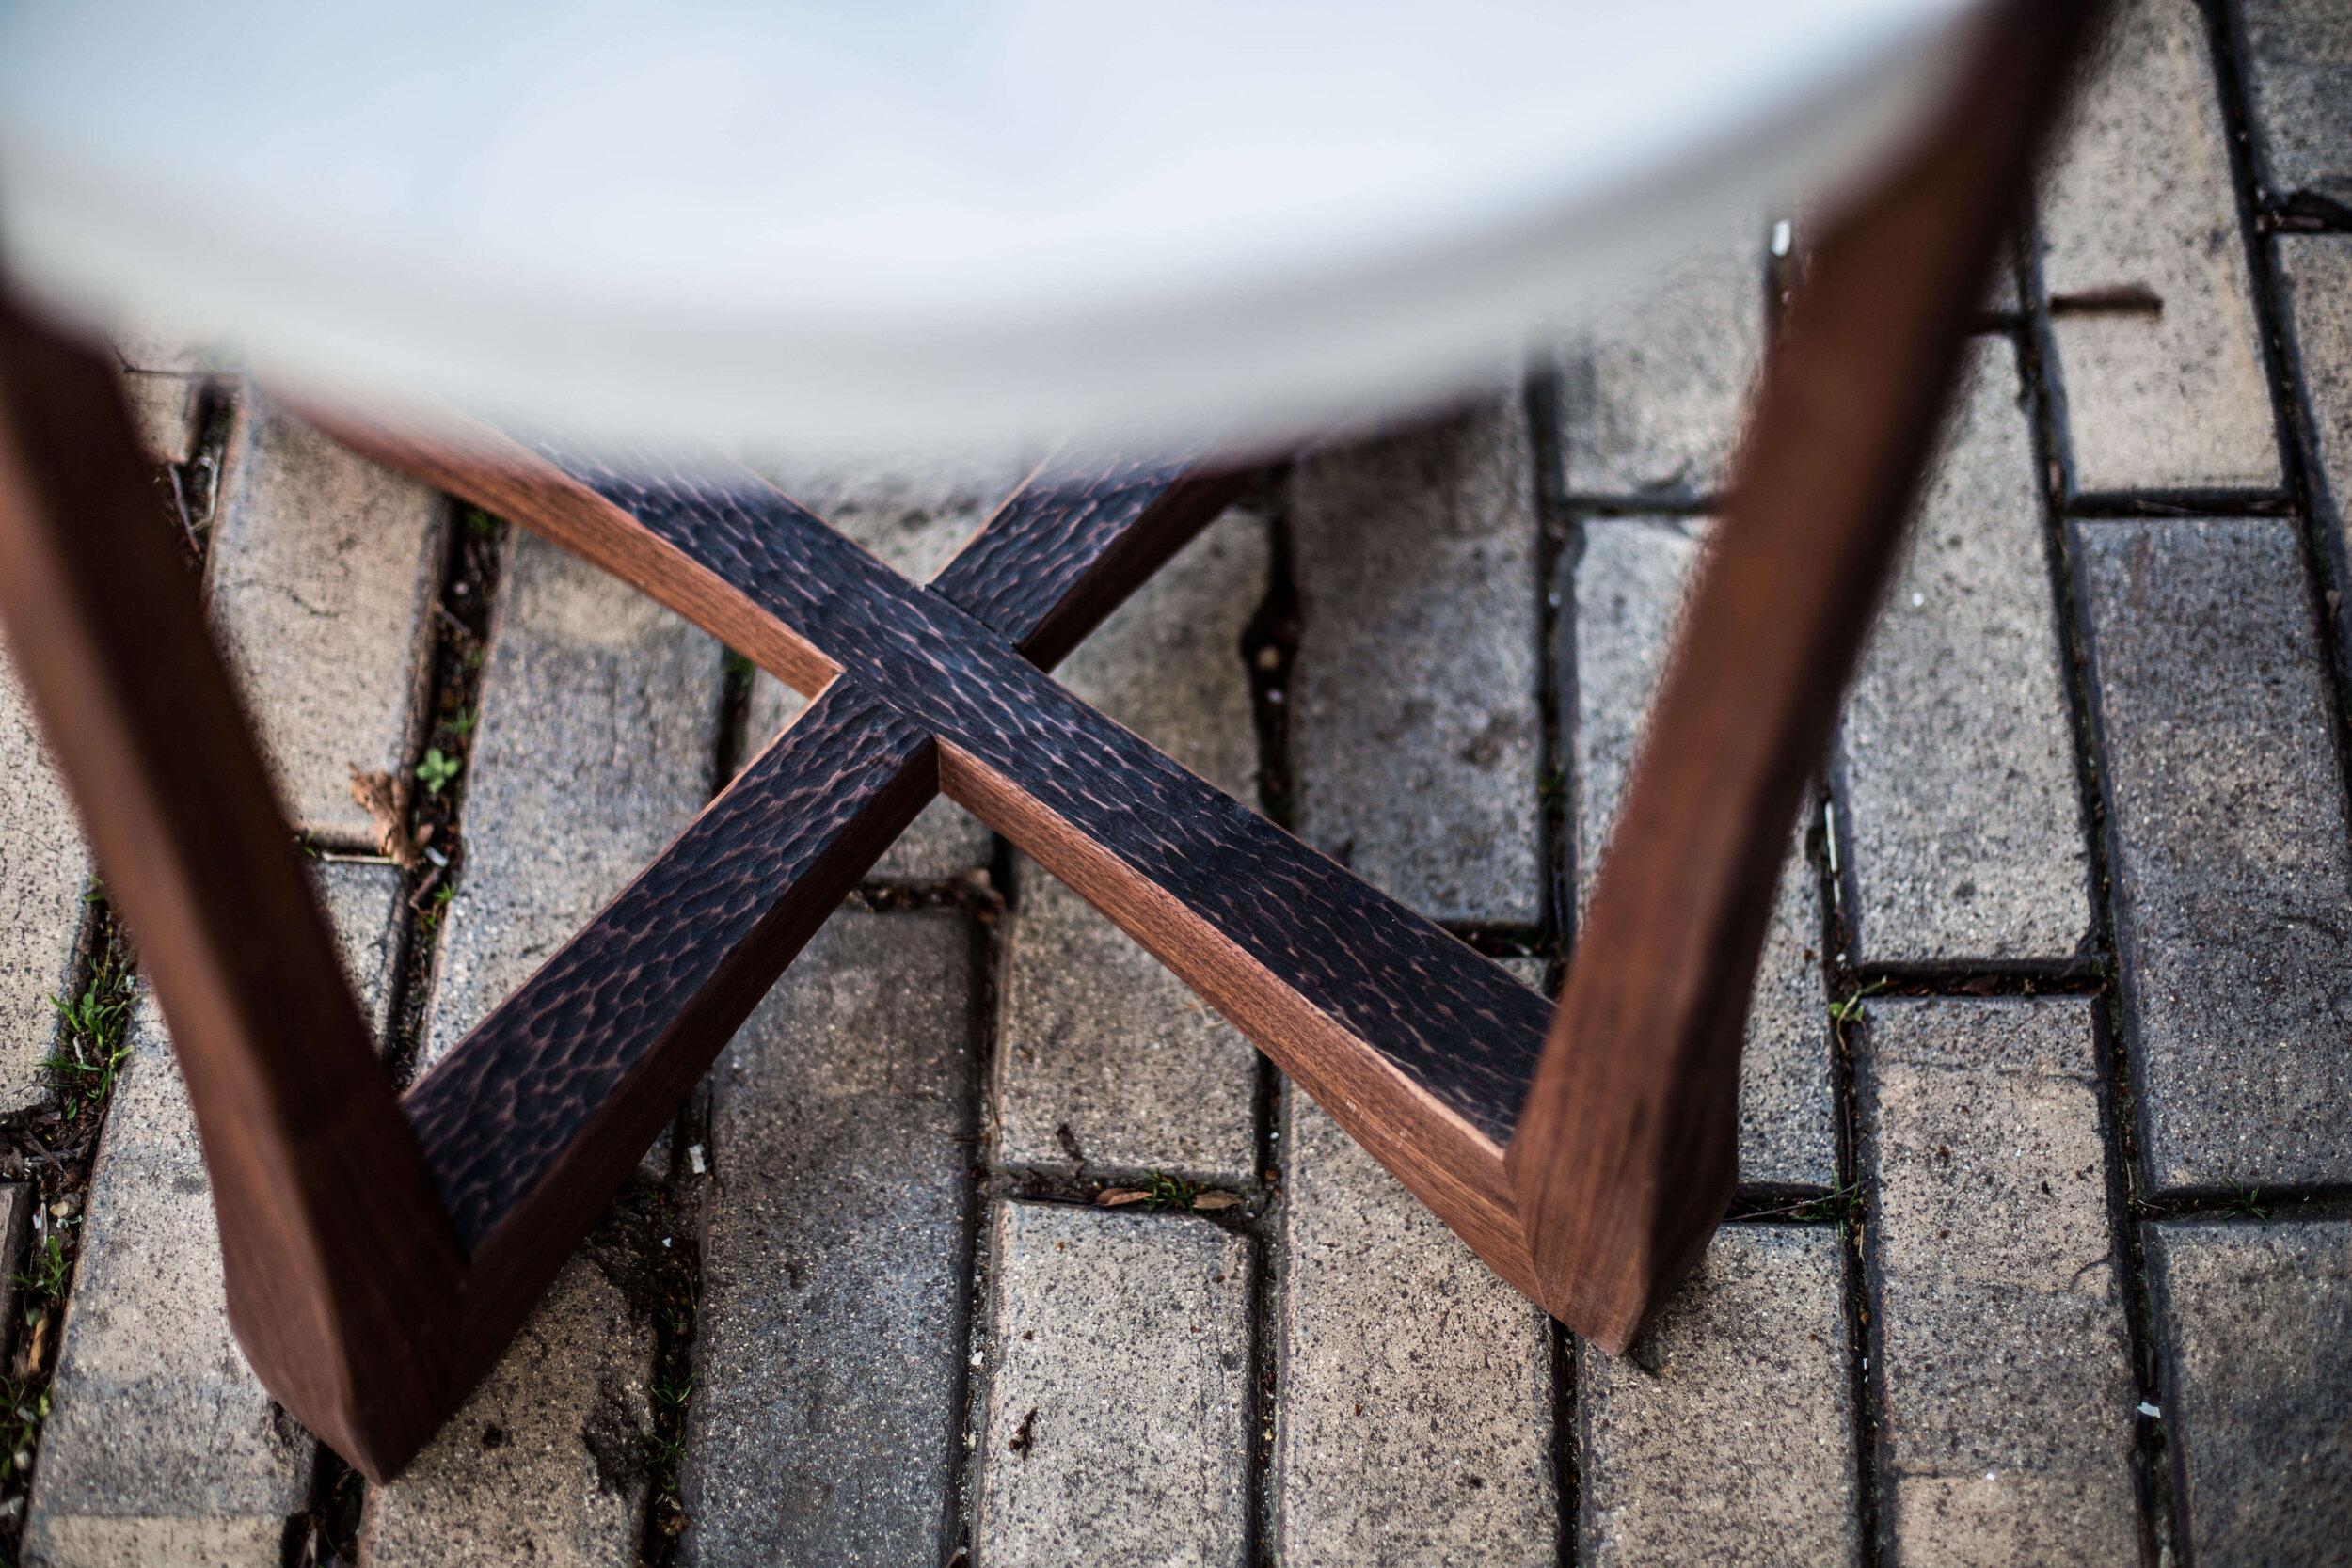 Alicia_Dietz_Modern_Concrete_Furniture_Carved_Wood_End_Table_Sofa_Table_Richmond_VA_10